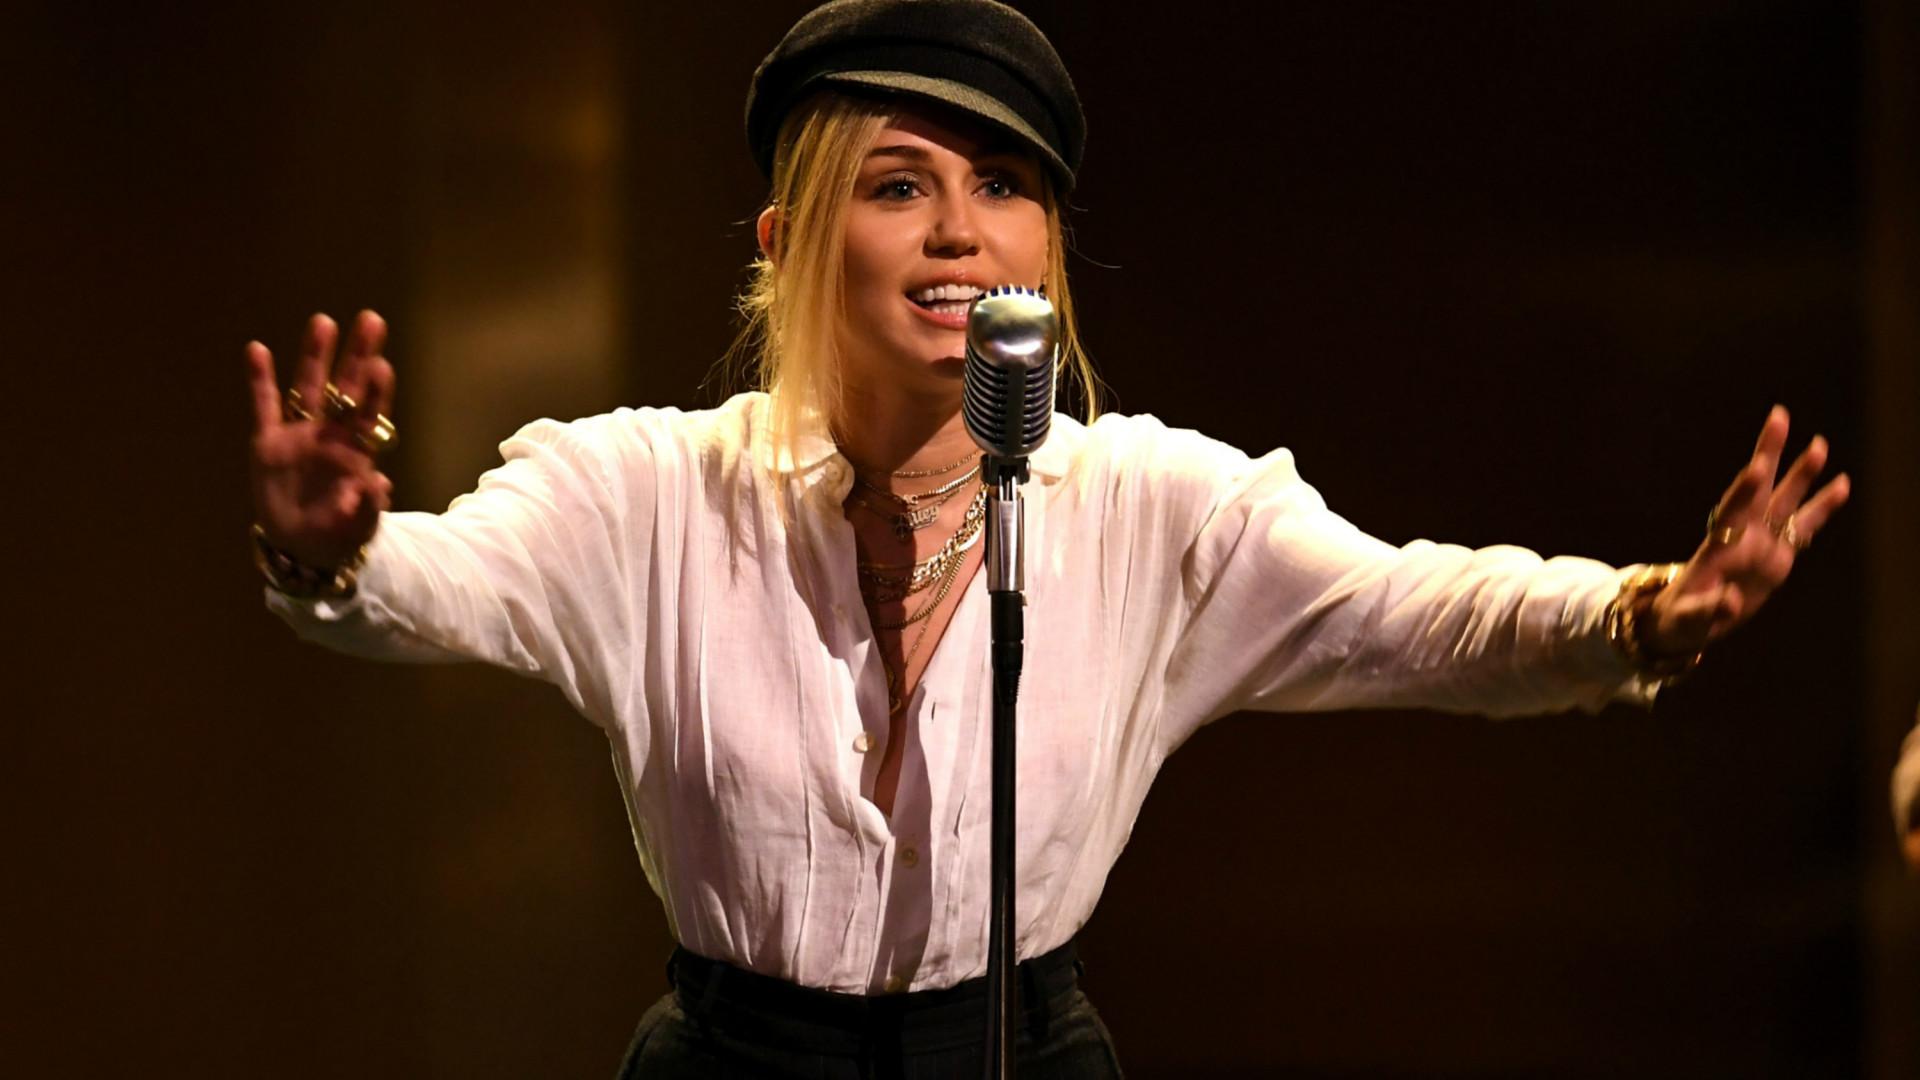 A dança sensual de Miley Cyrus nos bastidores de videoclipe